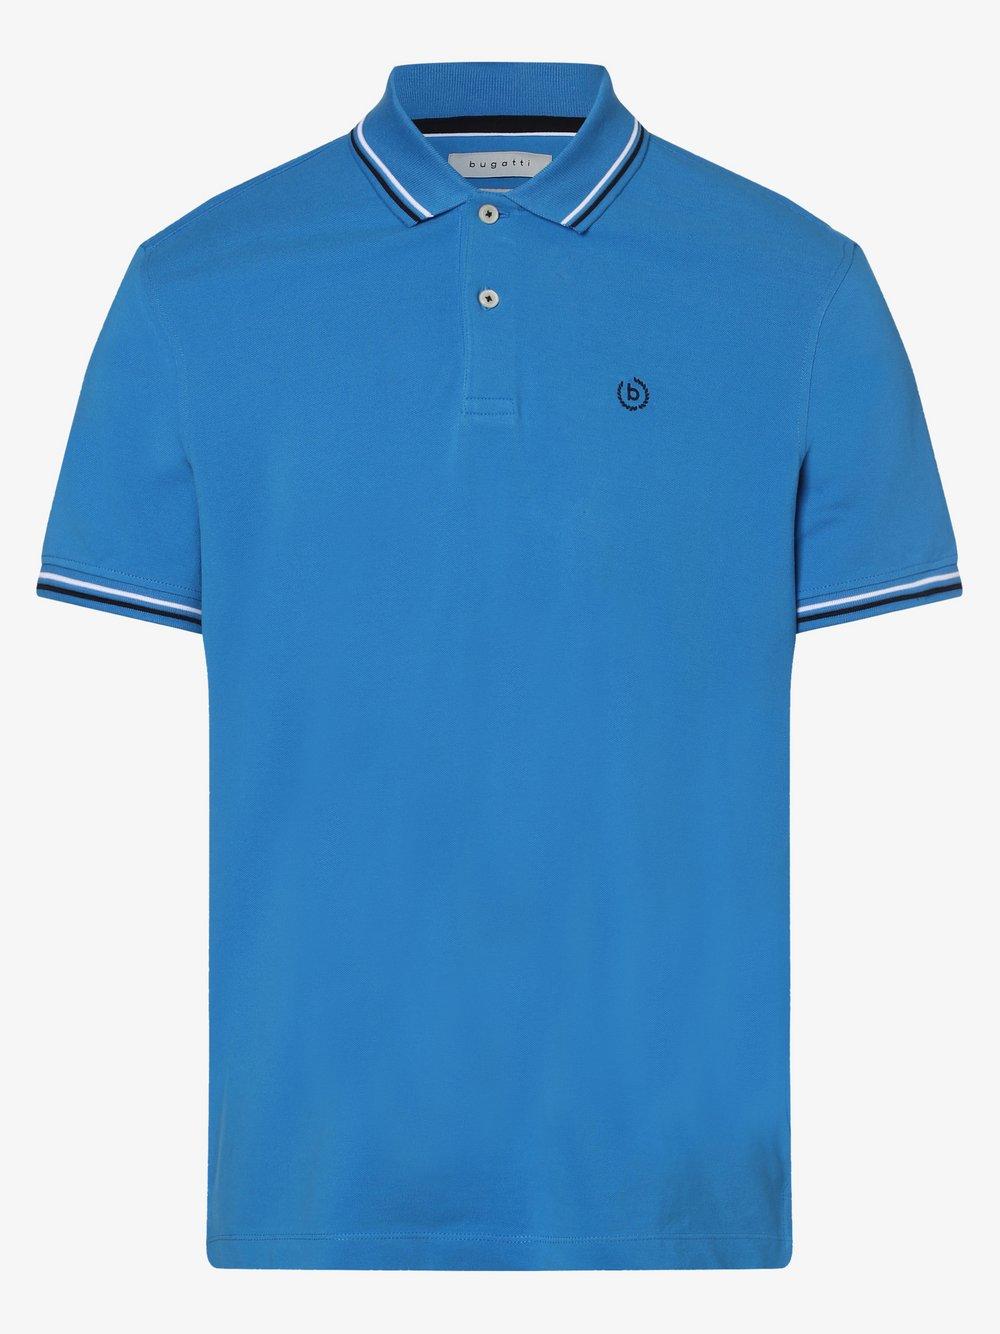 Bugatti - Męska koszulka polo, niebieski